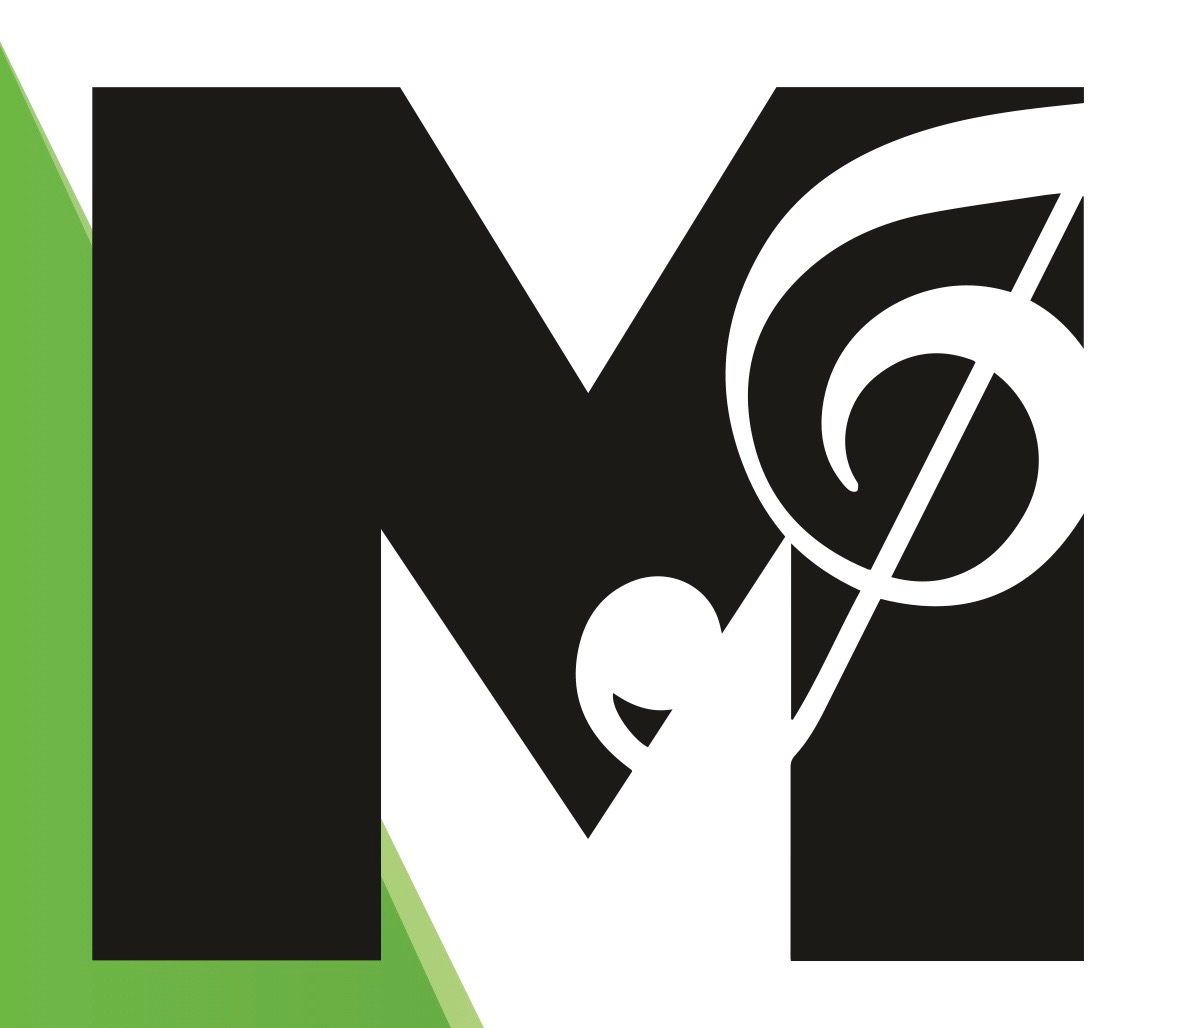 musicstation NEW LOGO 2016 Cropped.jpg